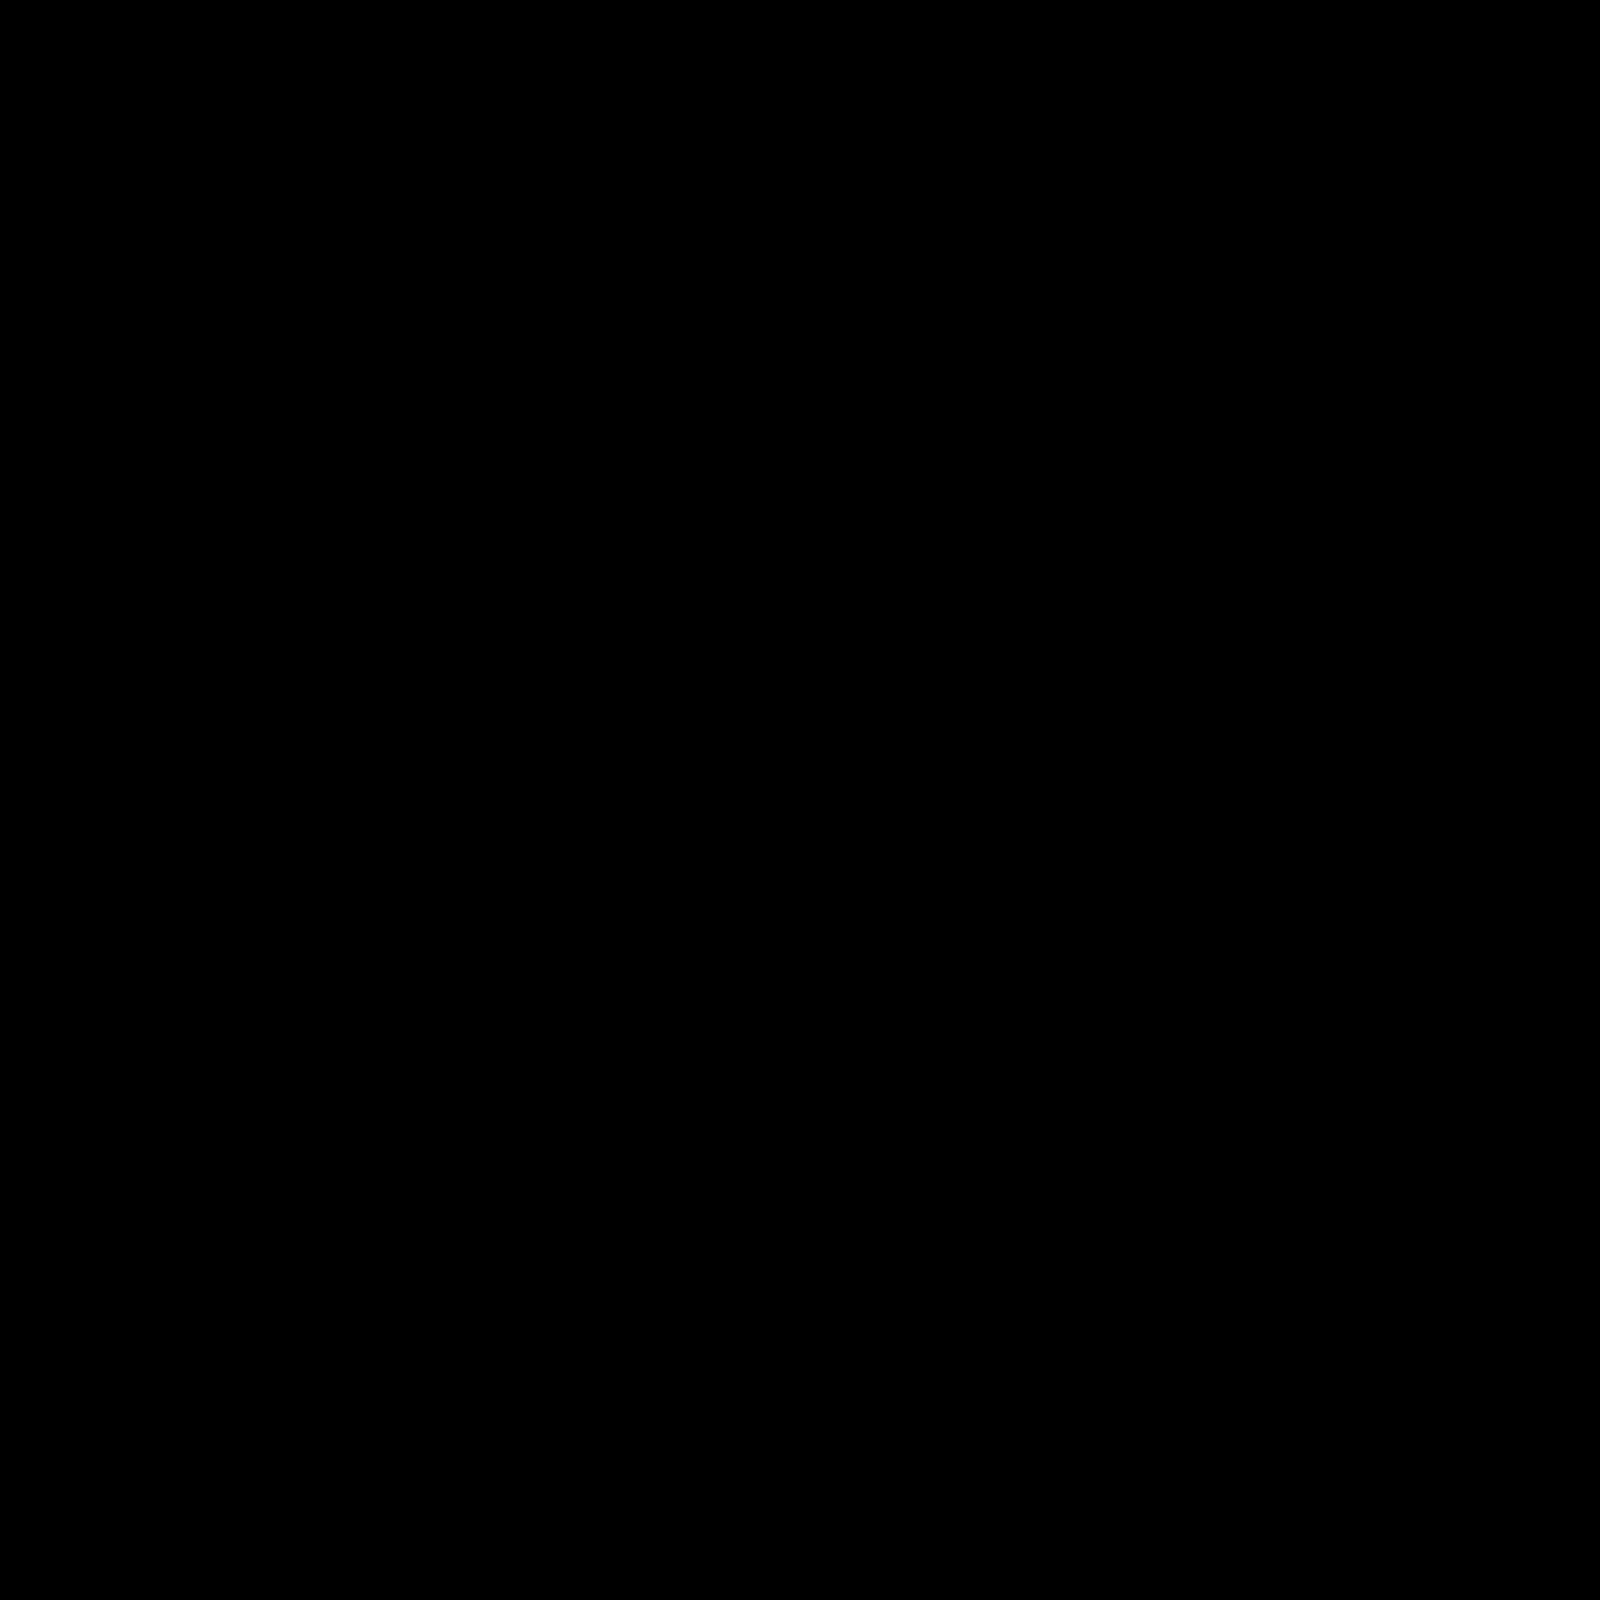 Handicapped icon